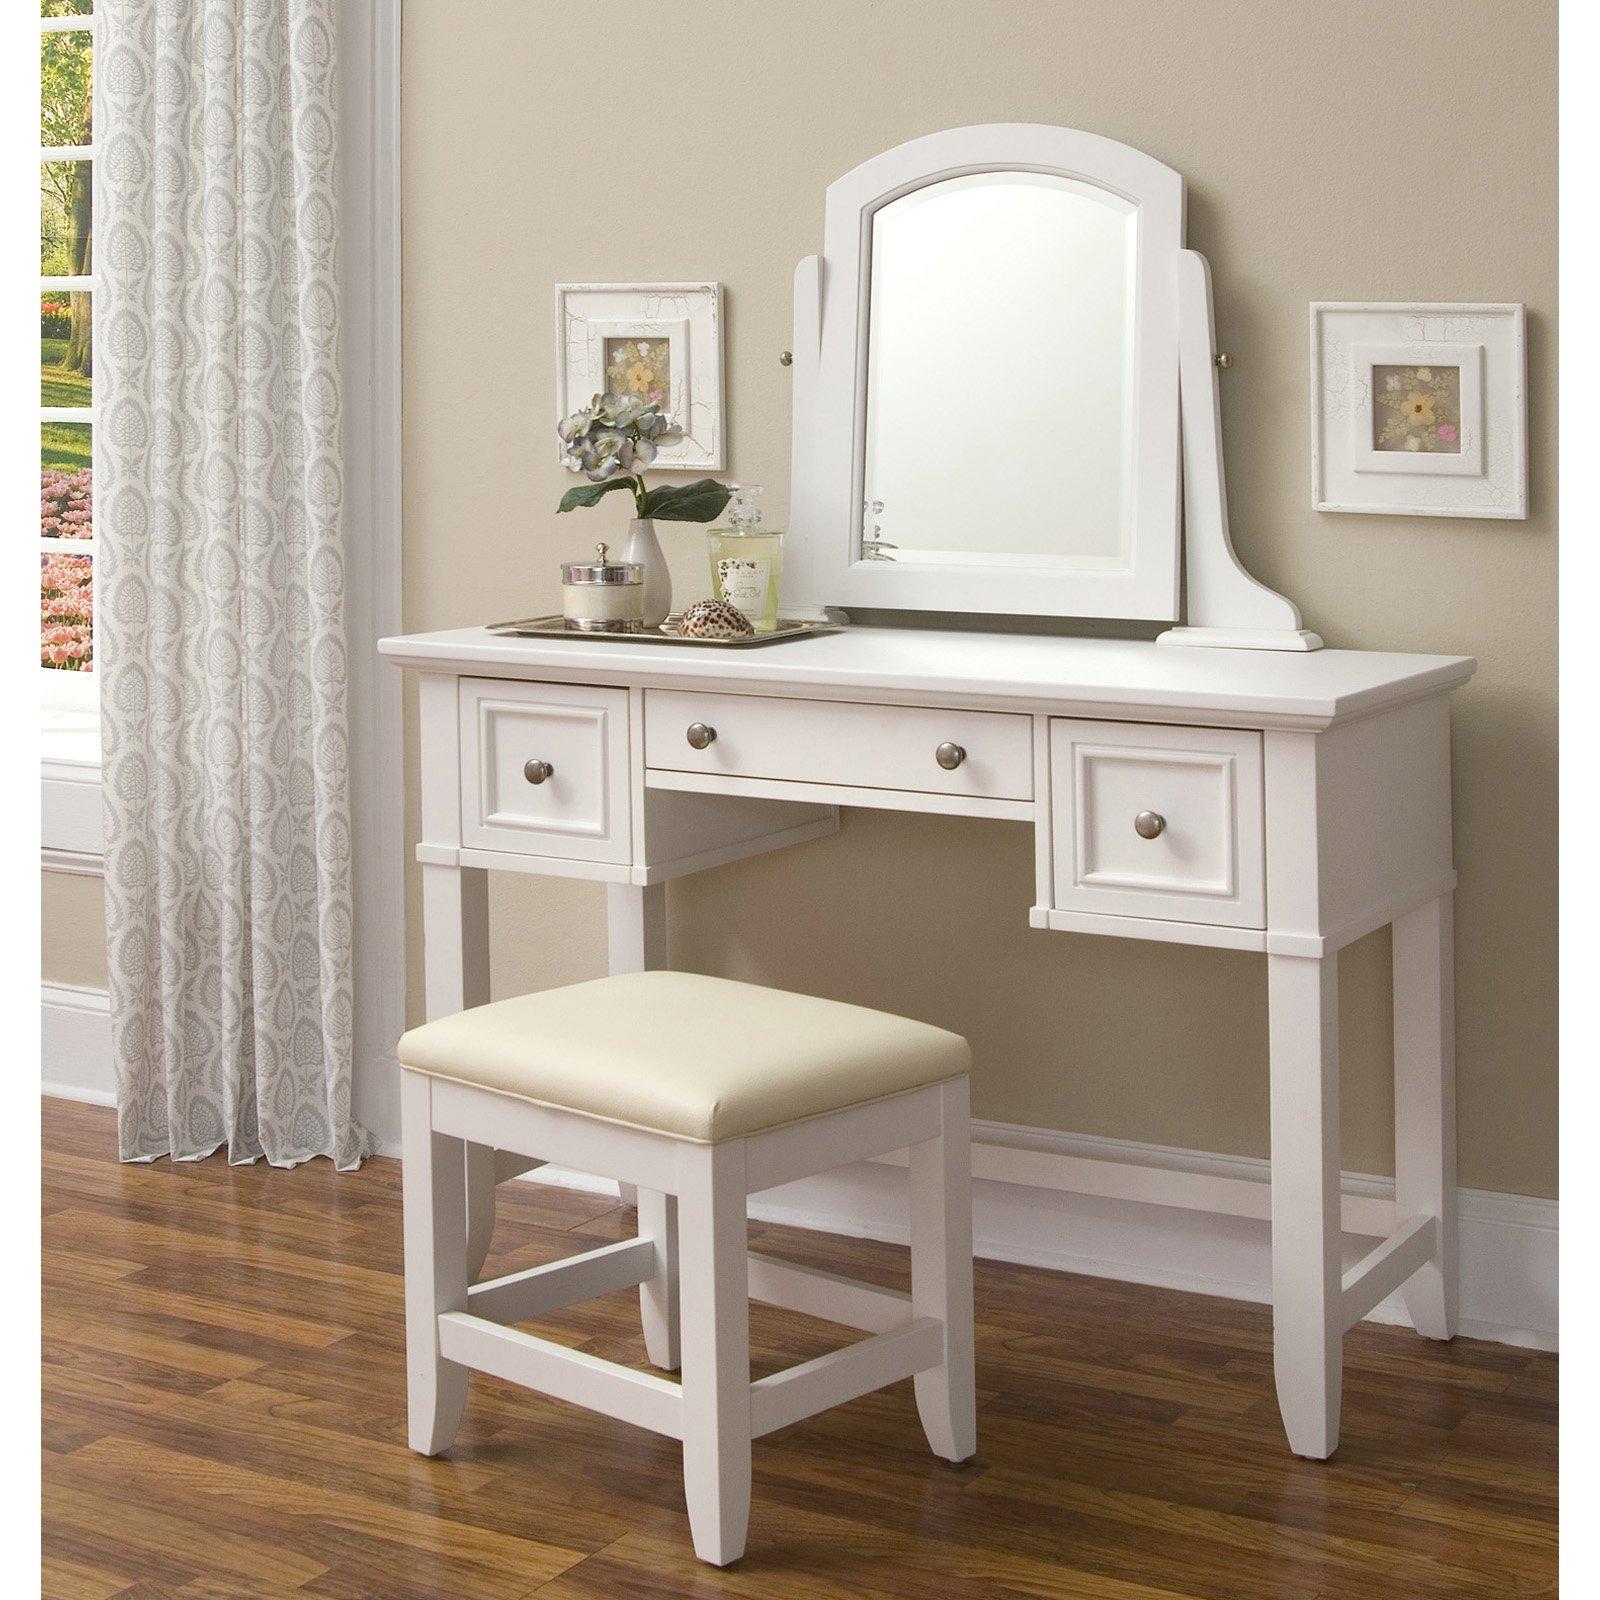 White Vanity DeskWhite Vanity Tables You Ll Love Wayfair